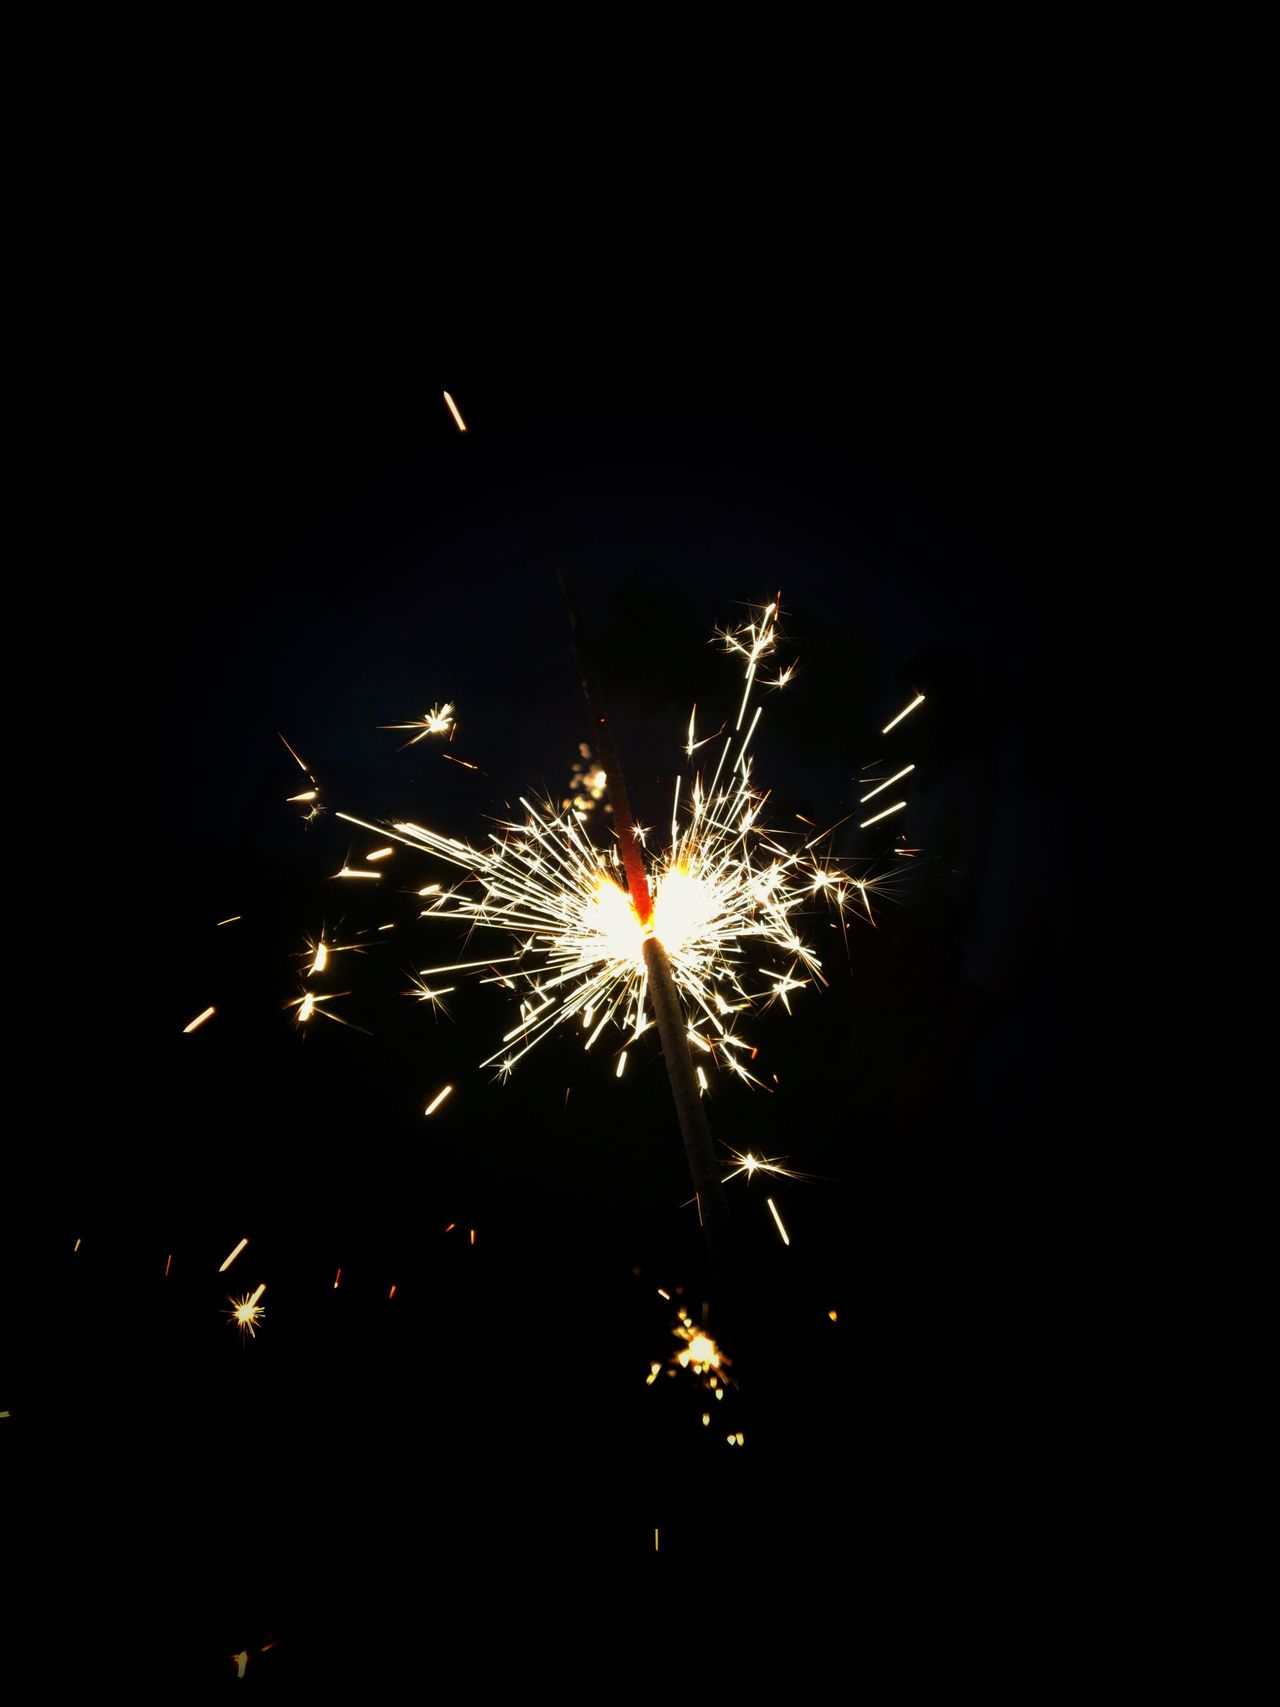 Christmastime Christmas Lights Fireworks Celebration Glowing Illuminated Justtakingpictures